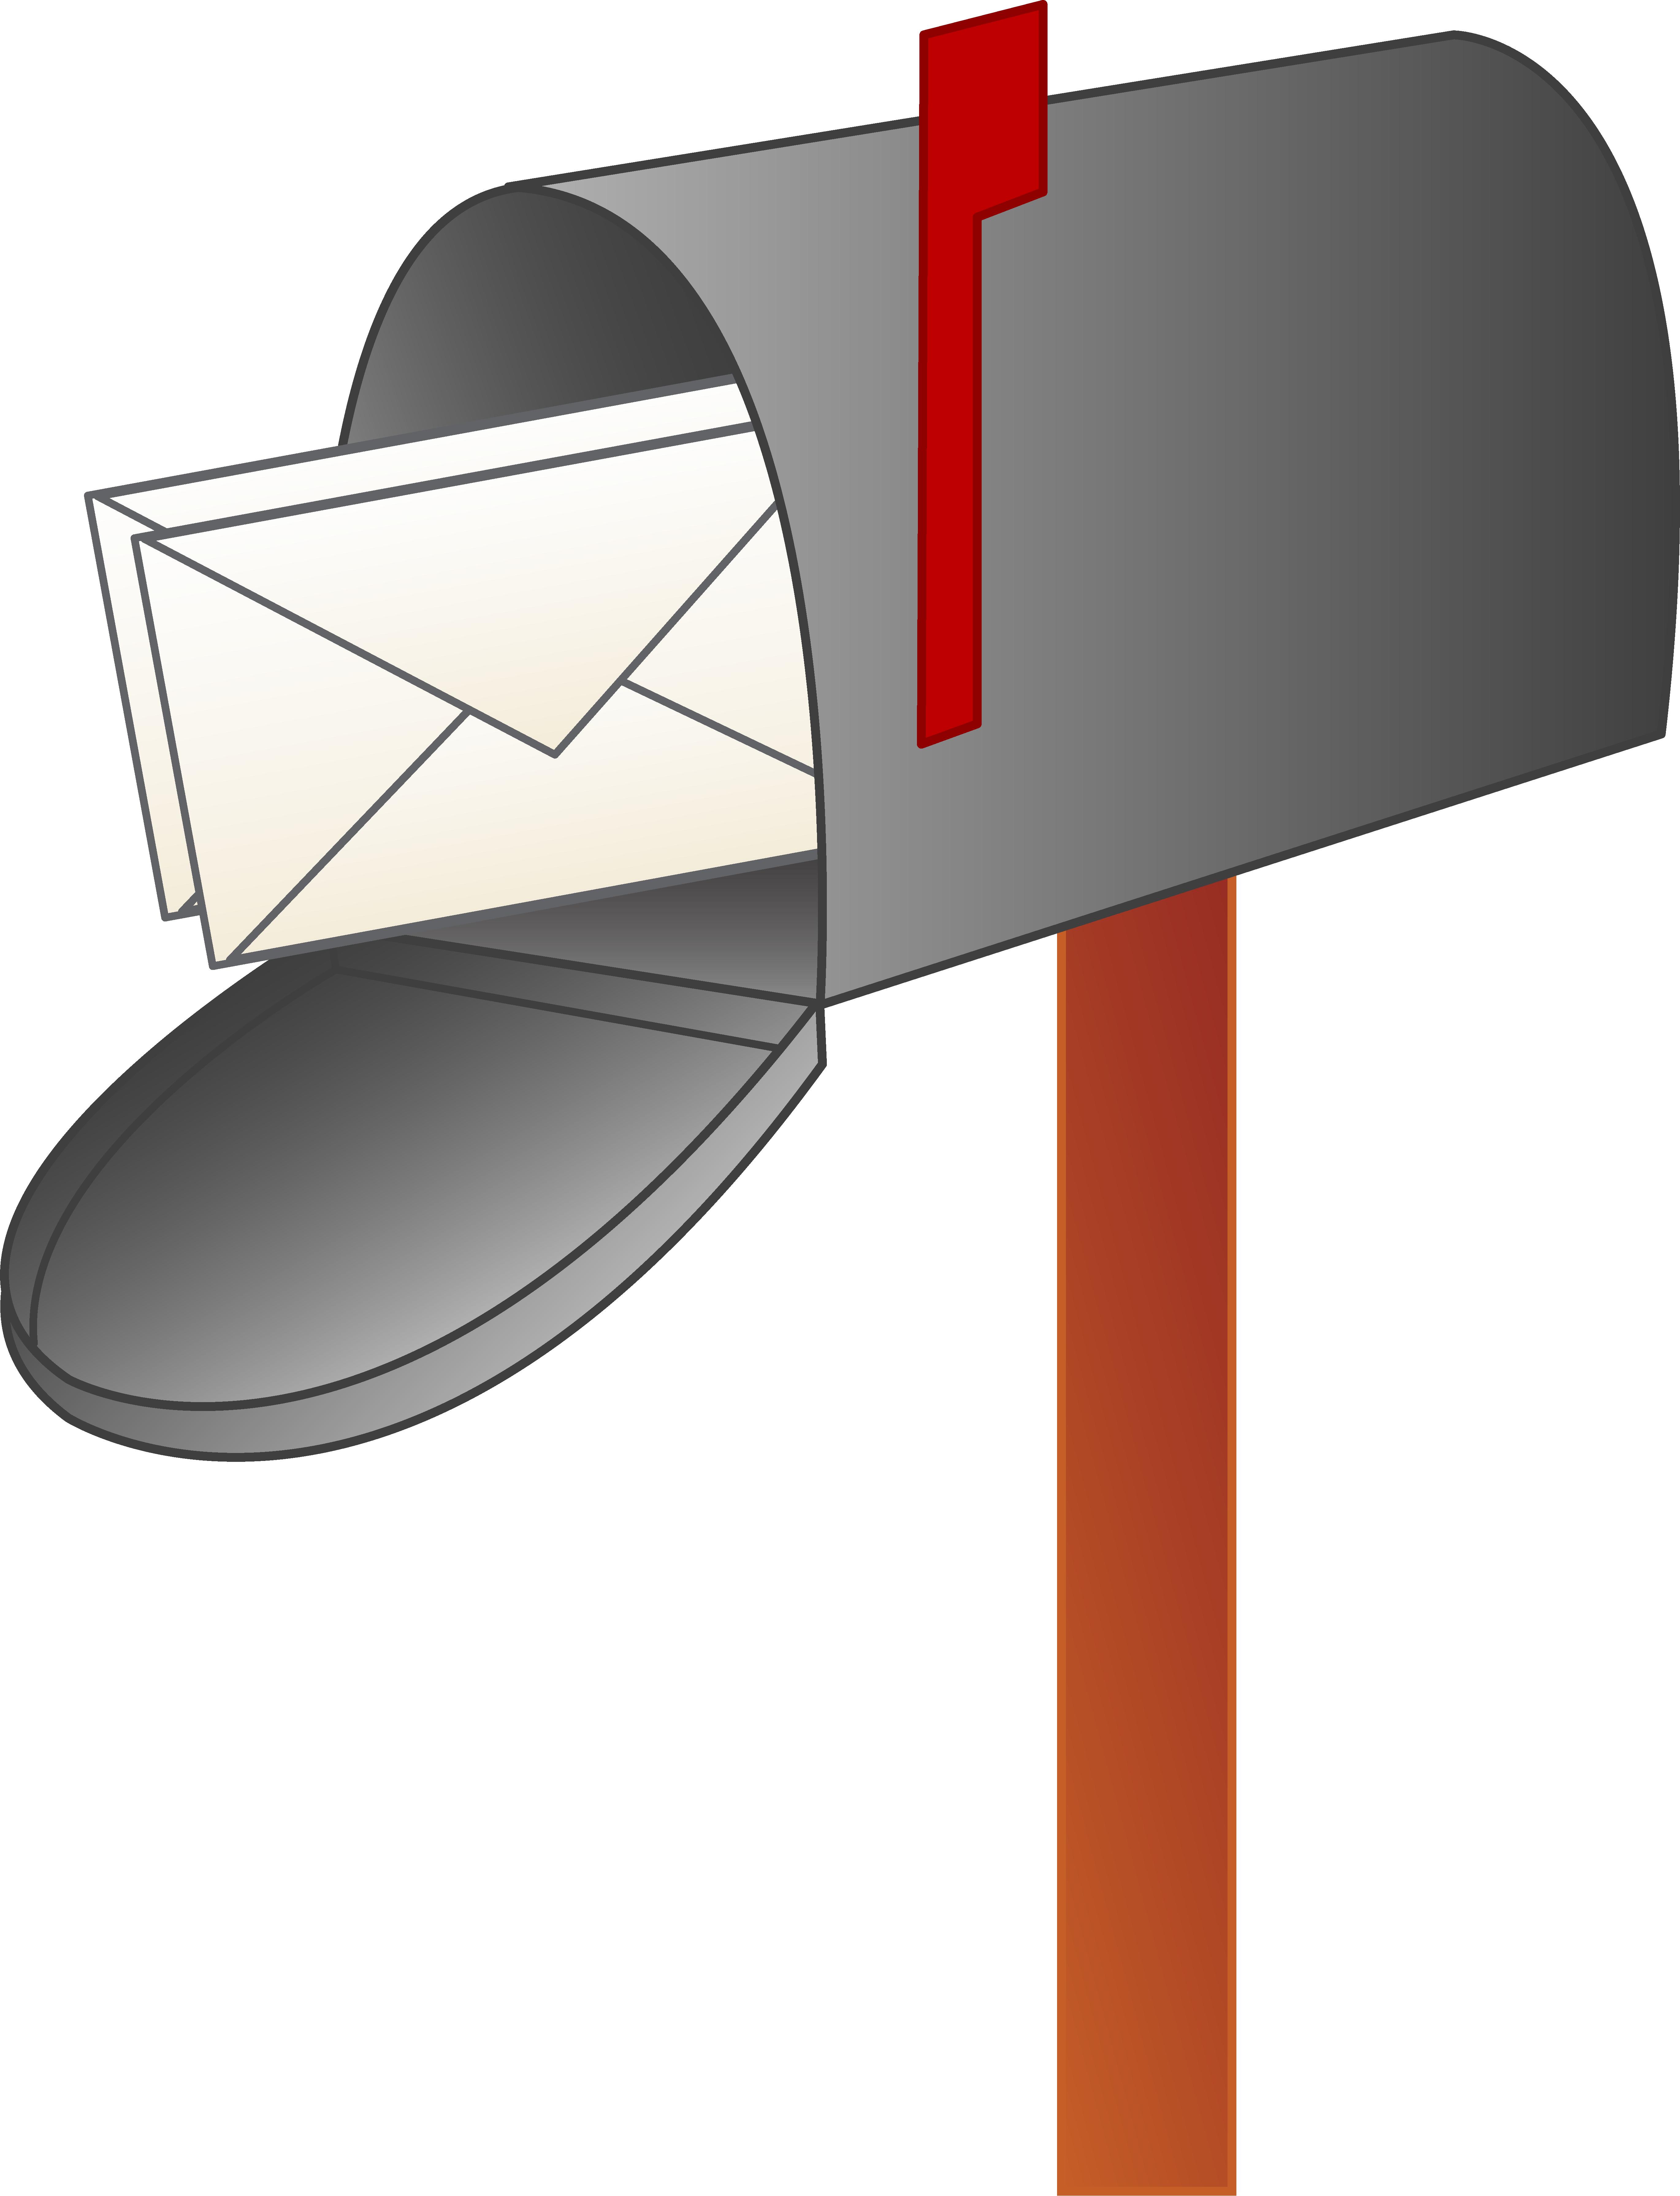 Cartoon Mailbox Clipart-Cartoon Mailbox Clipart-7